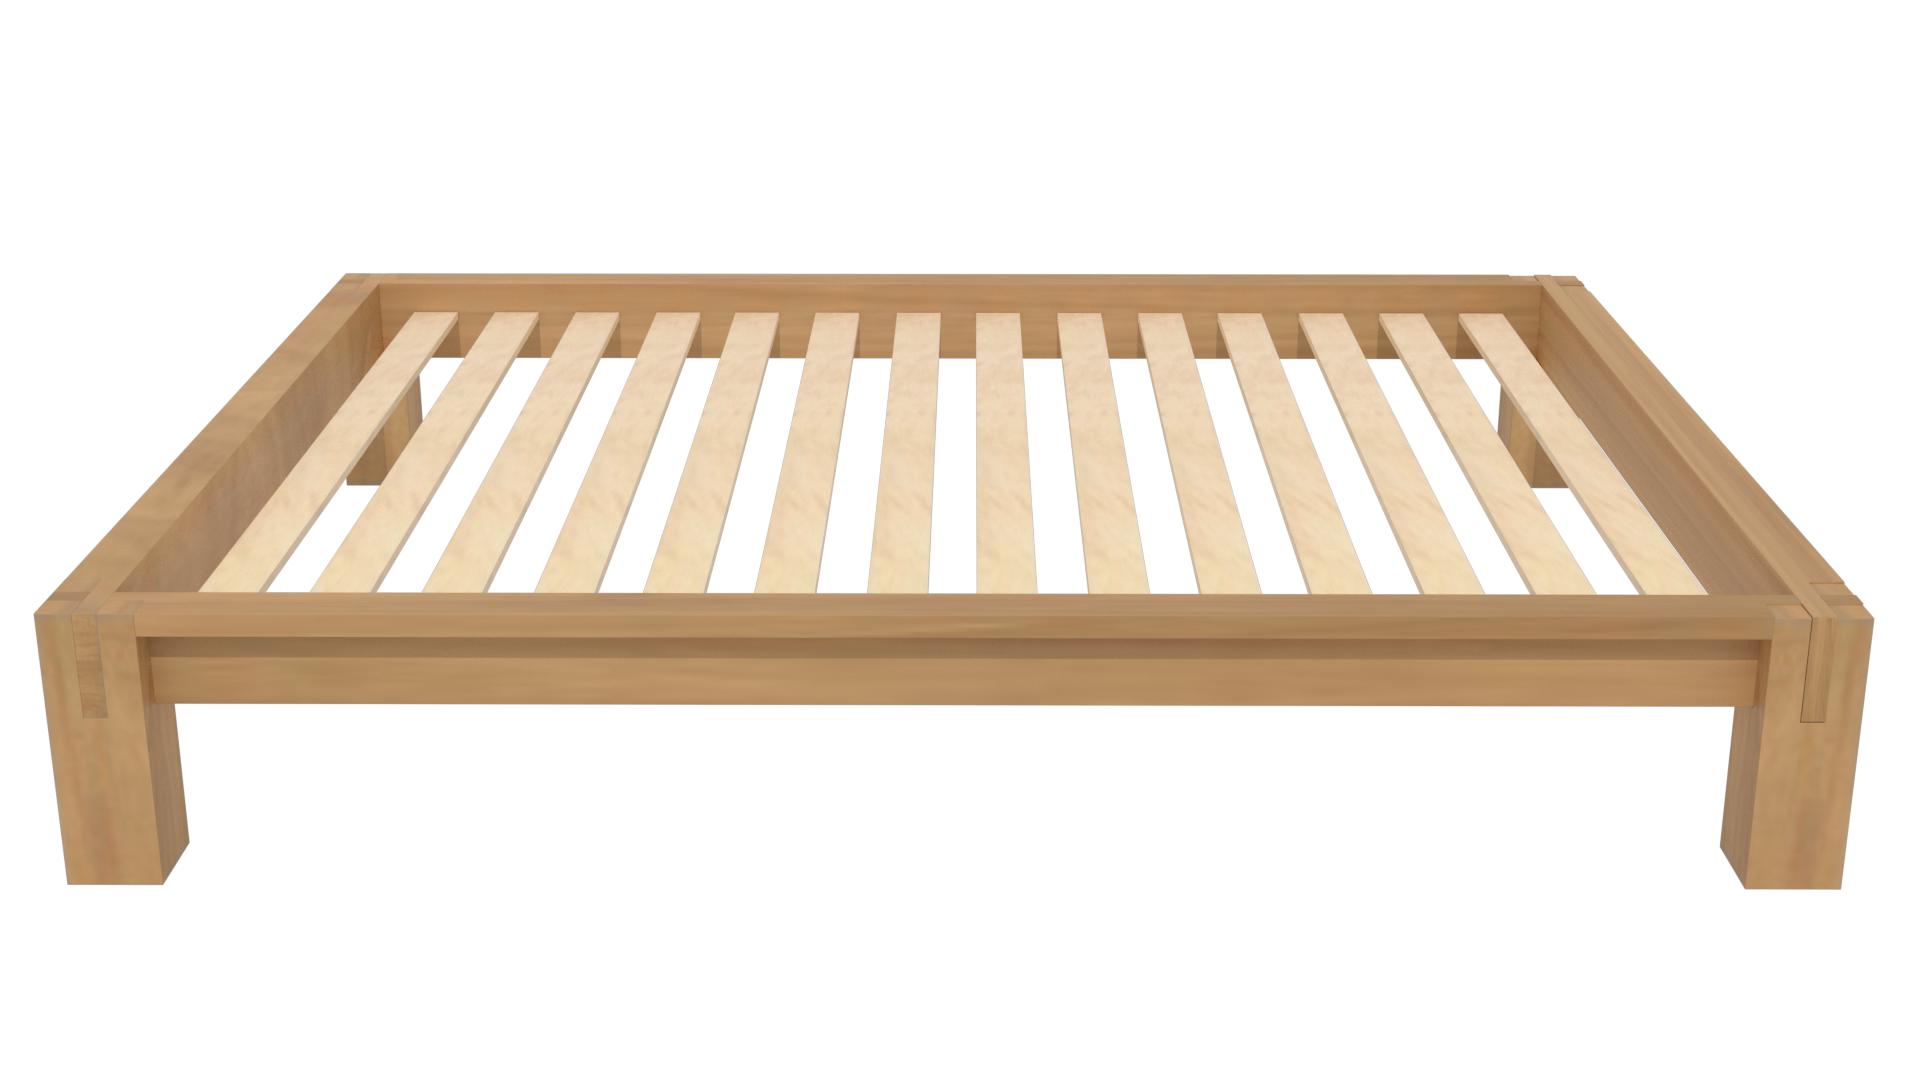 Raku Tatami High Rise Platform Bed in Honey Oak